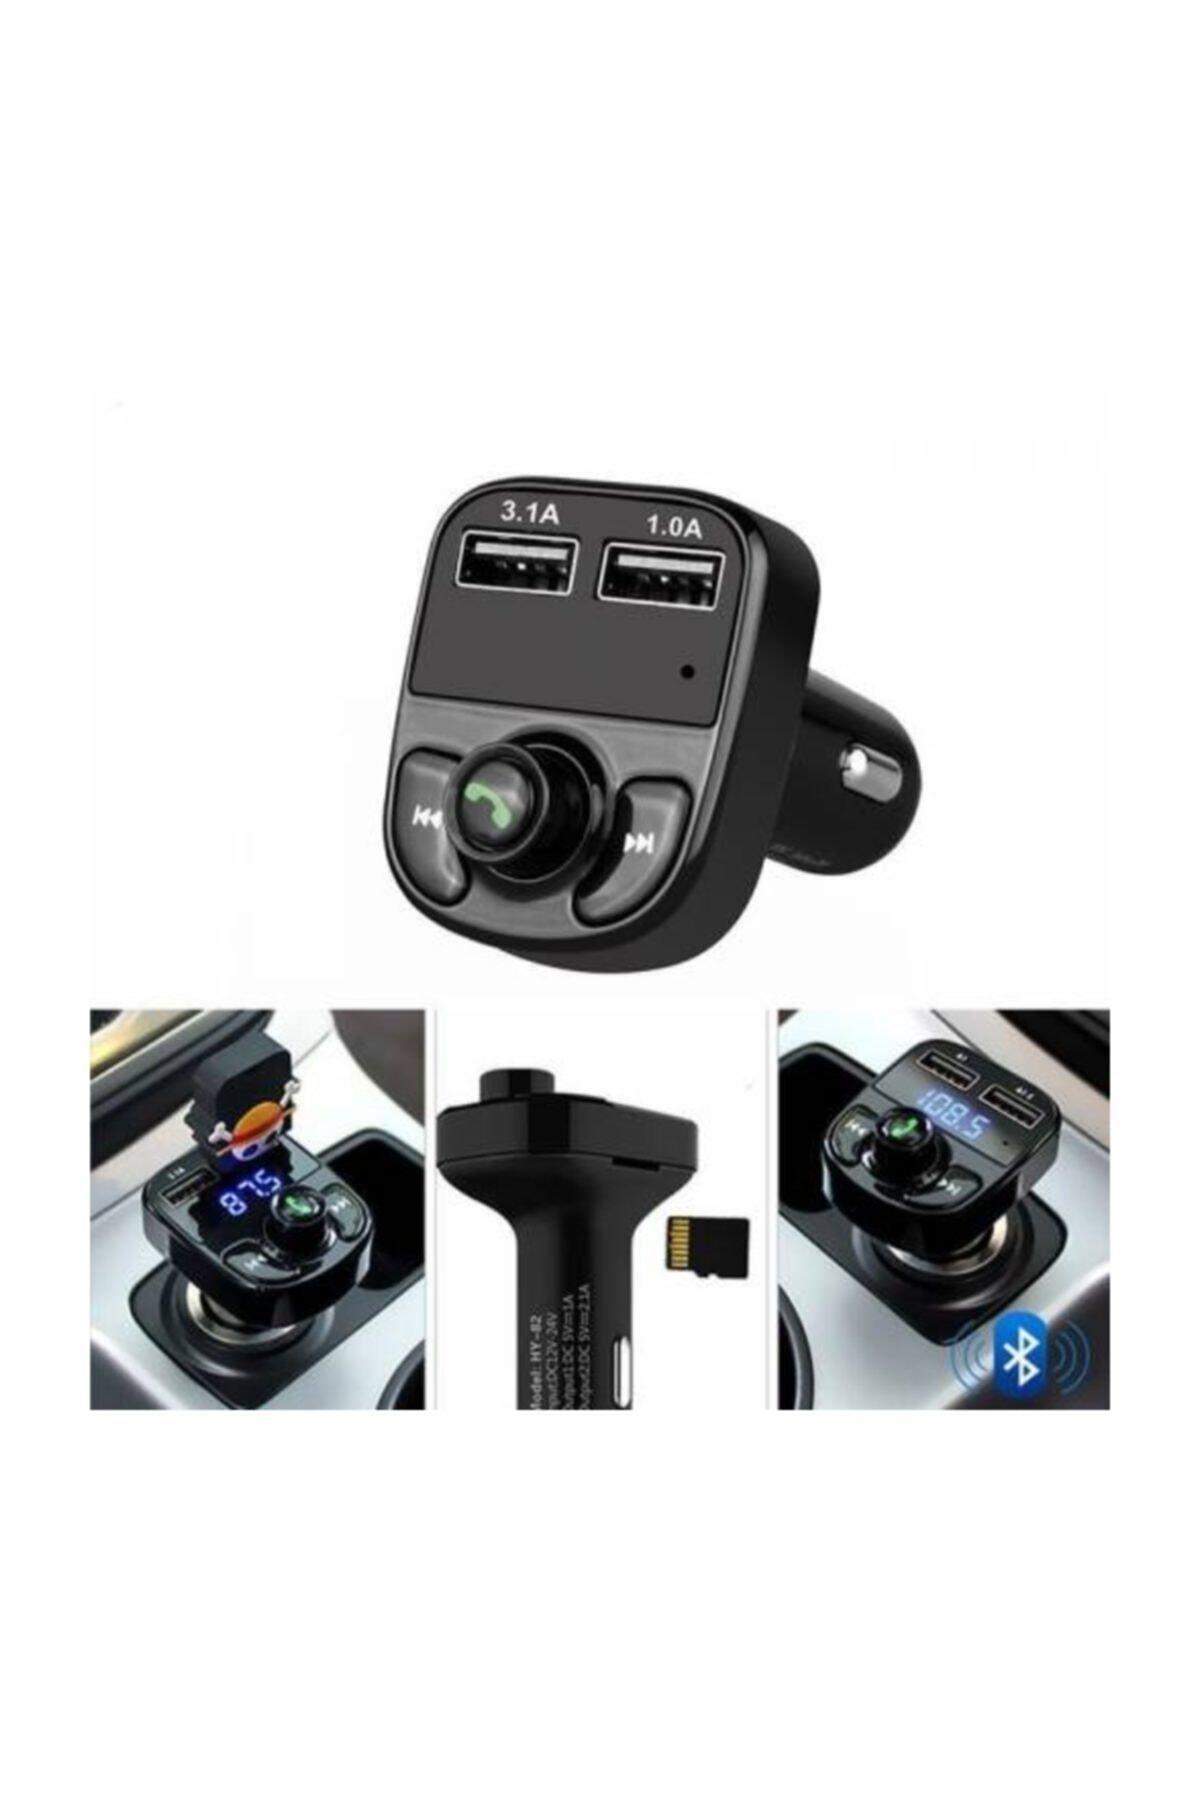 Concord Car X8 Araç Fm Transmitter,bluetooth,usb,mp3,sd Kart Çakmaklık Girişli Oto Müzik Çalar Kiti 2